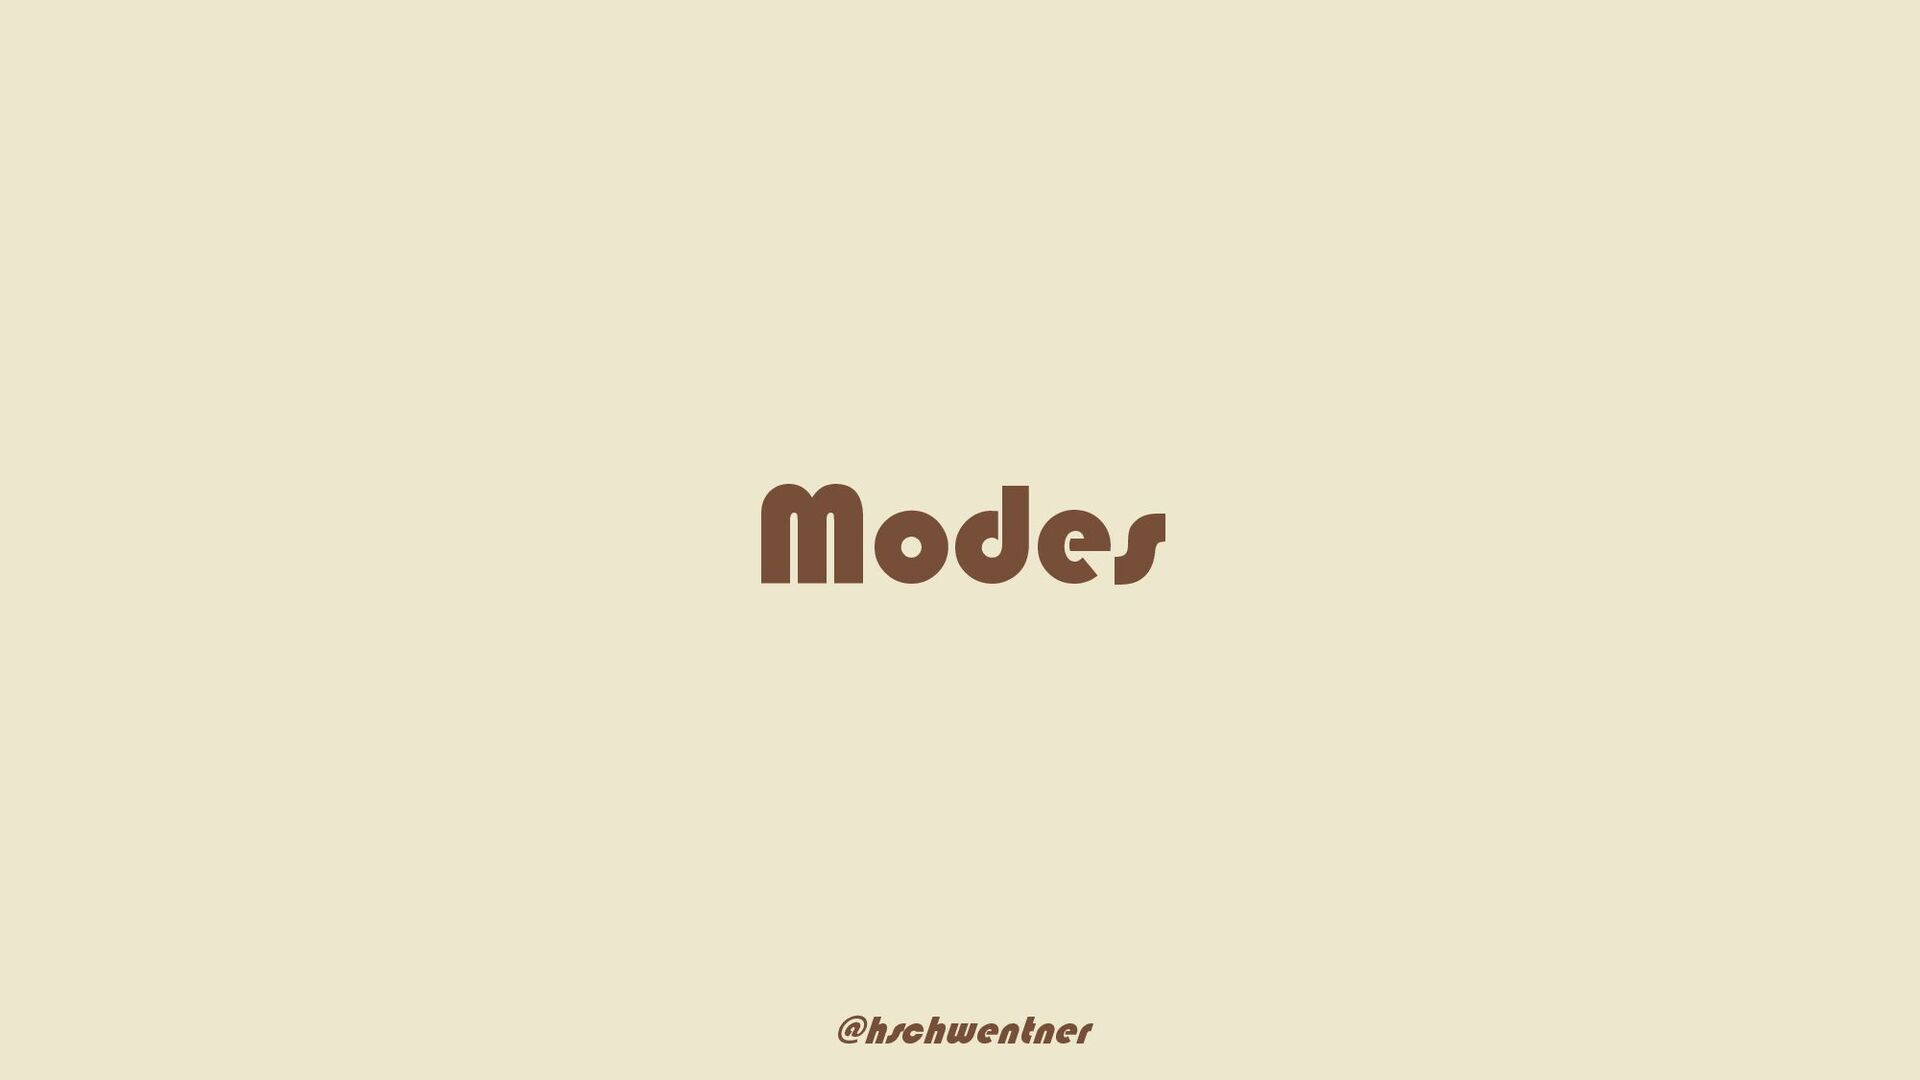 @hschwentner From Domain Story to Code